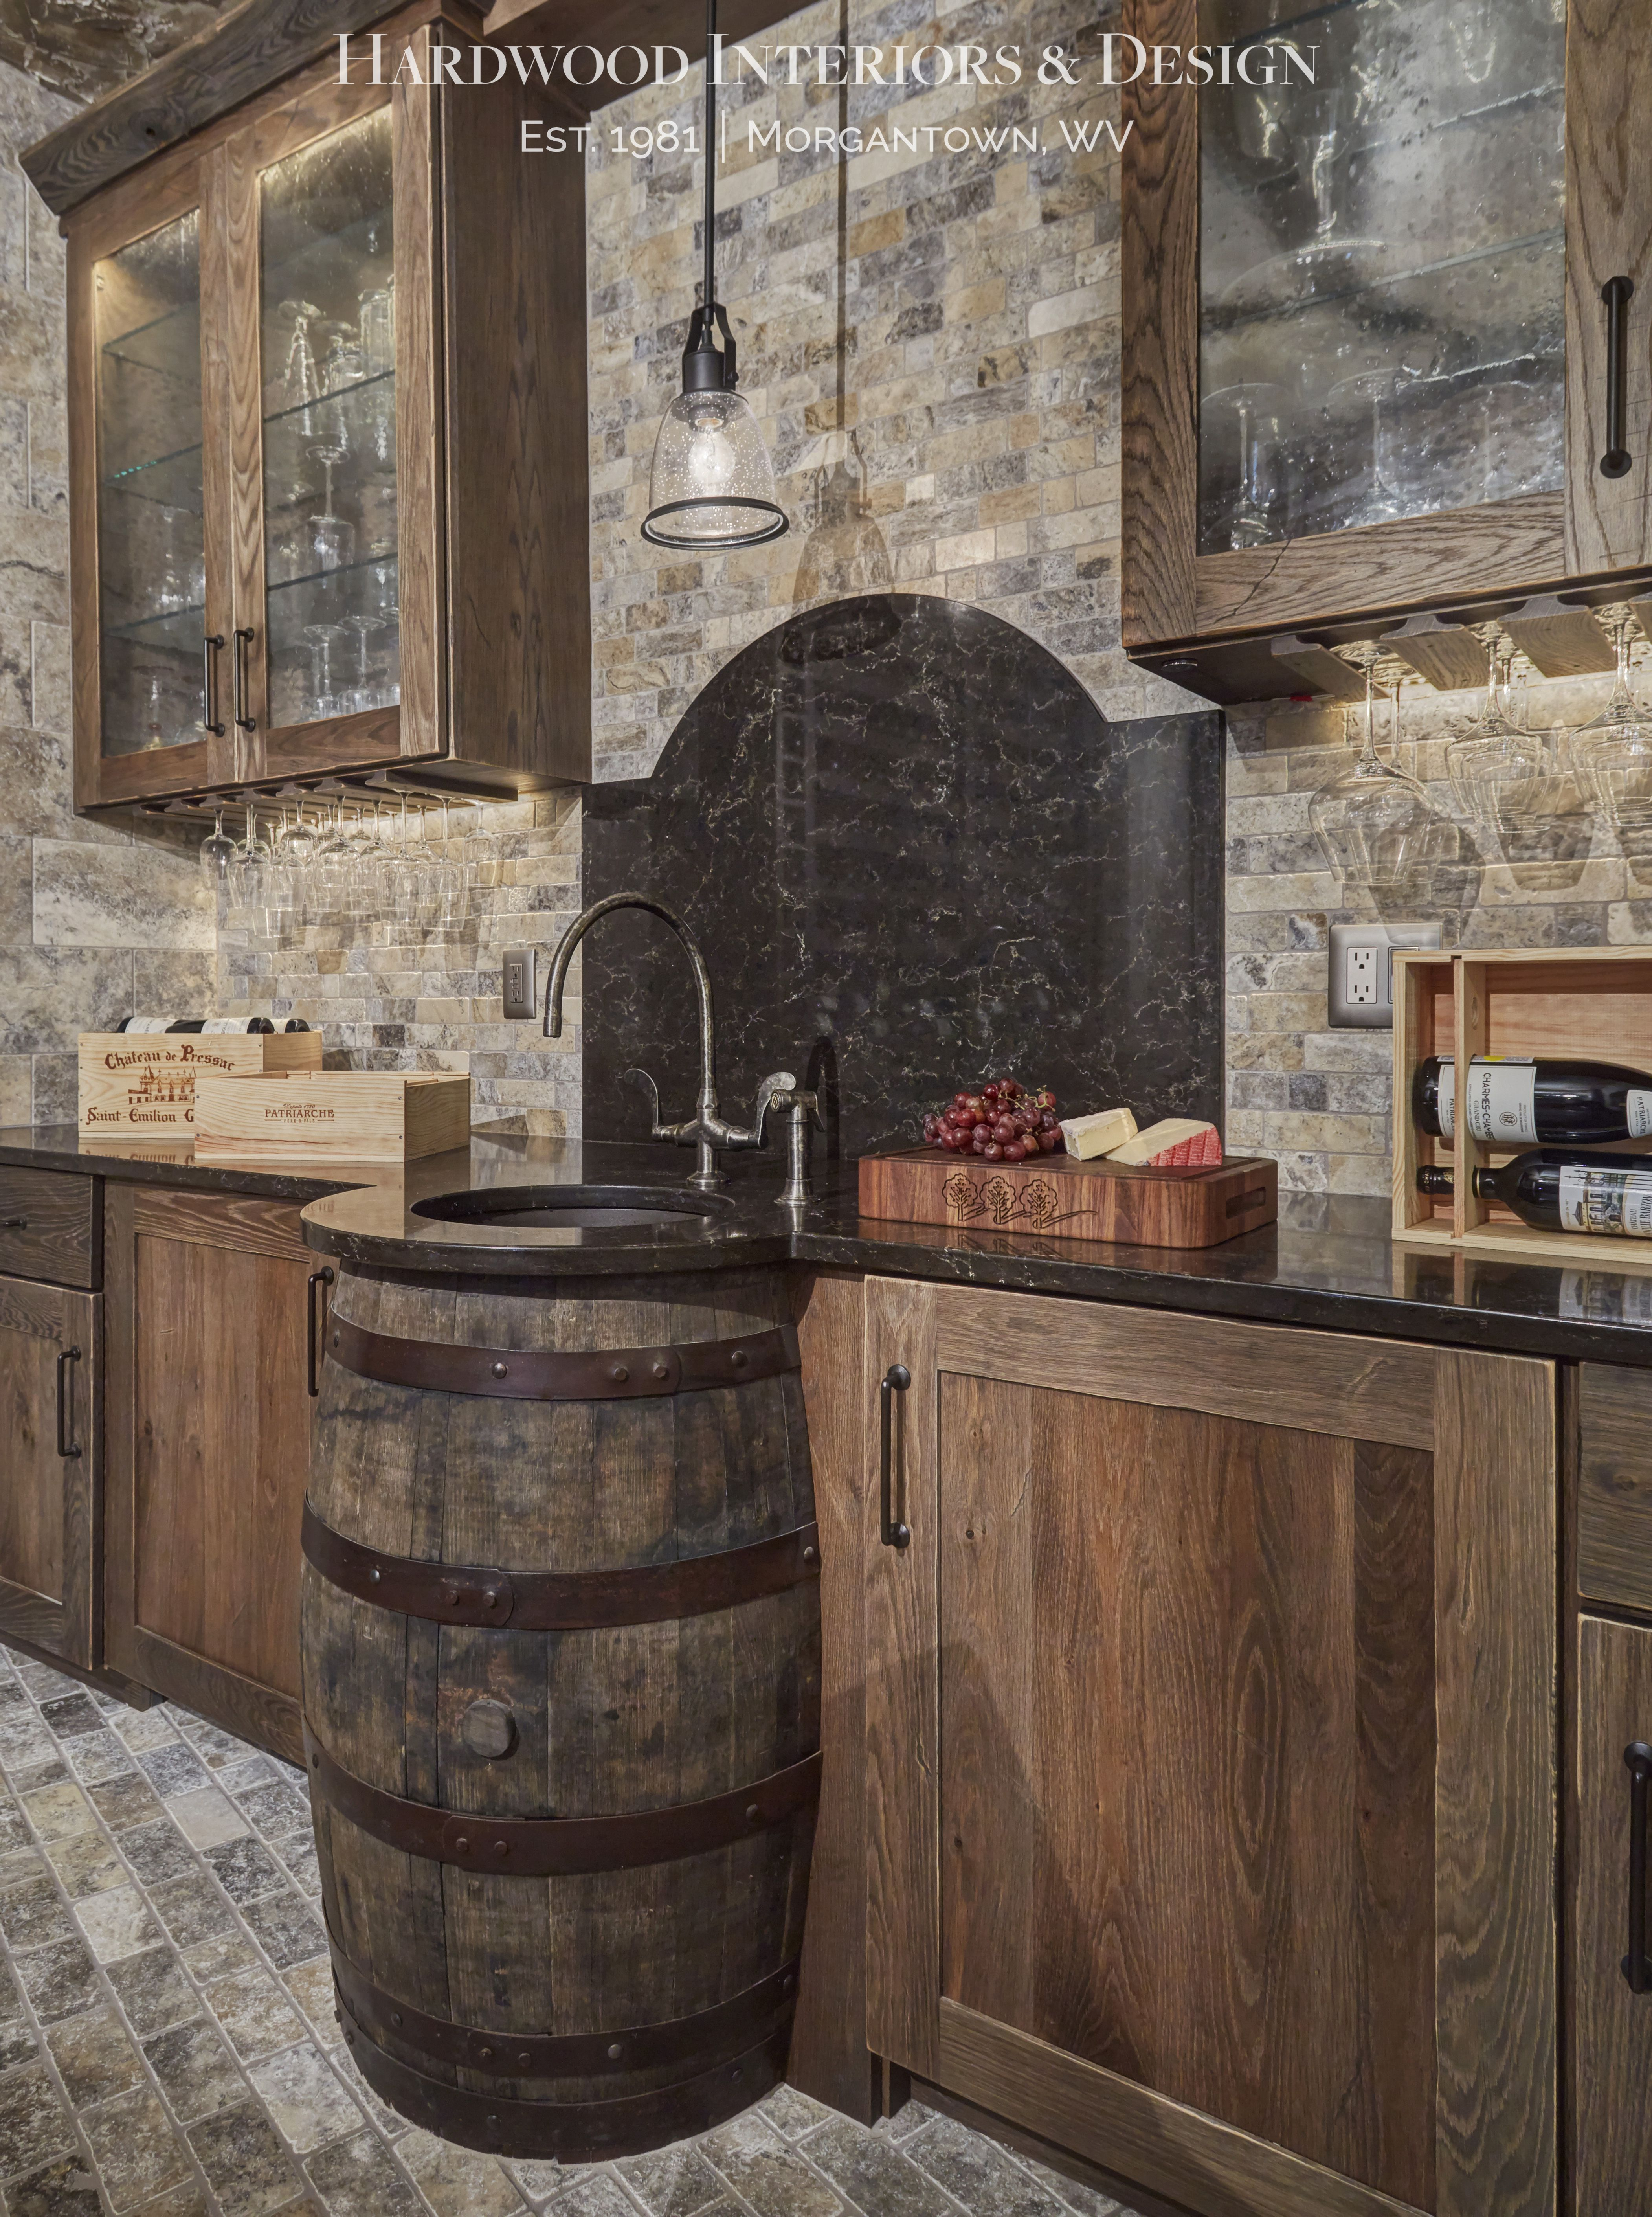 Hardwood Interiors Design Custom Wine Cellar With Wine Barrel Sink Sink Barrel Sink Custom Wine Cellars